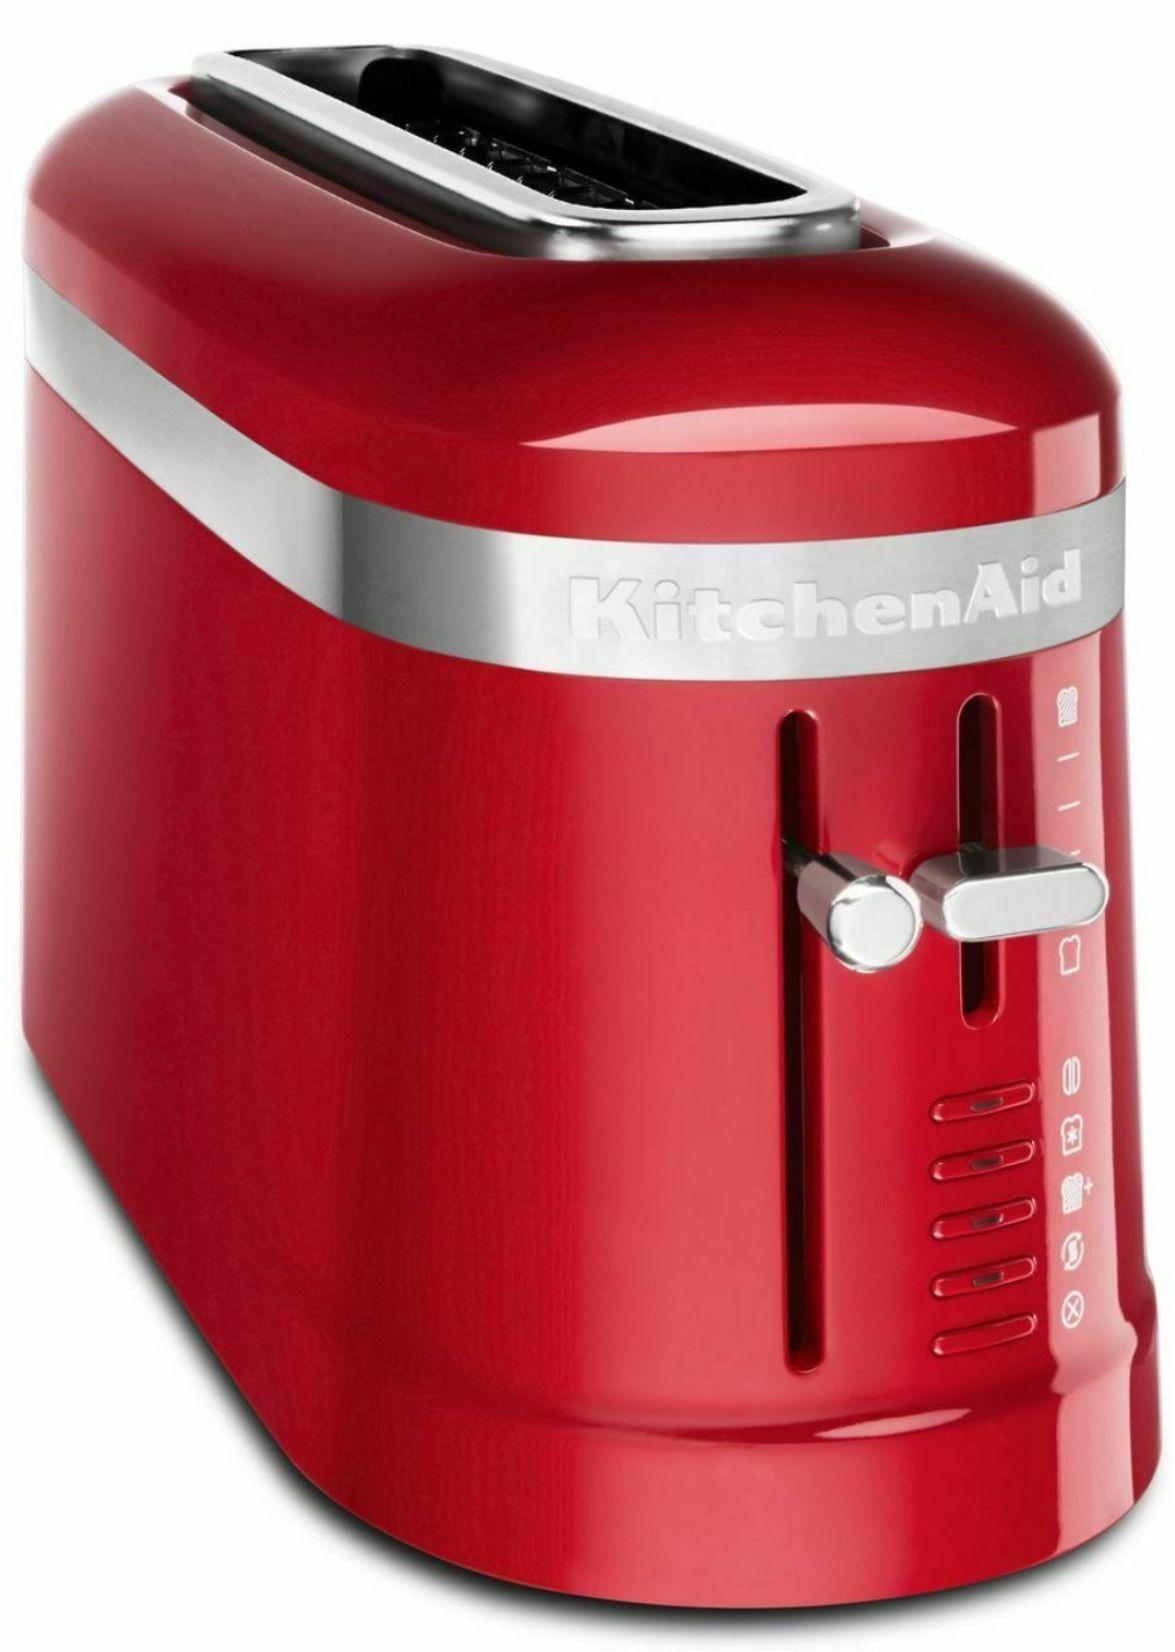 Kitchenaid 2 slice long slot toaster with highlift lever